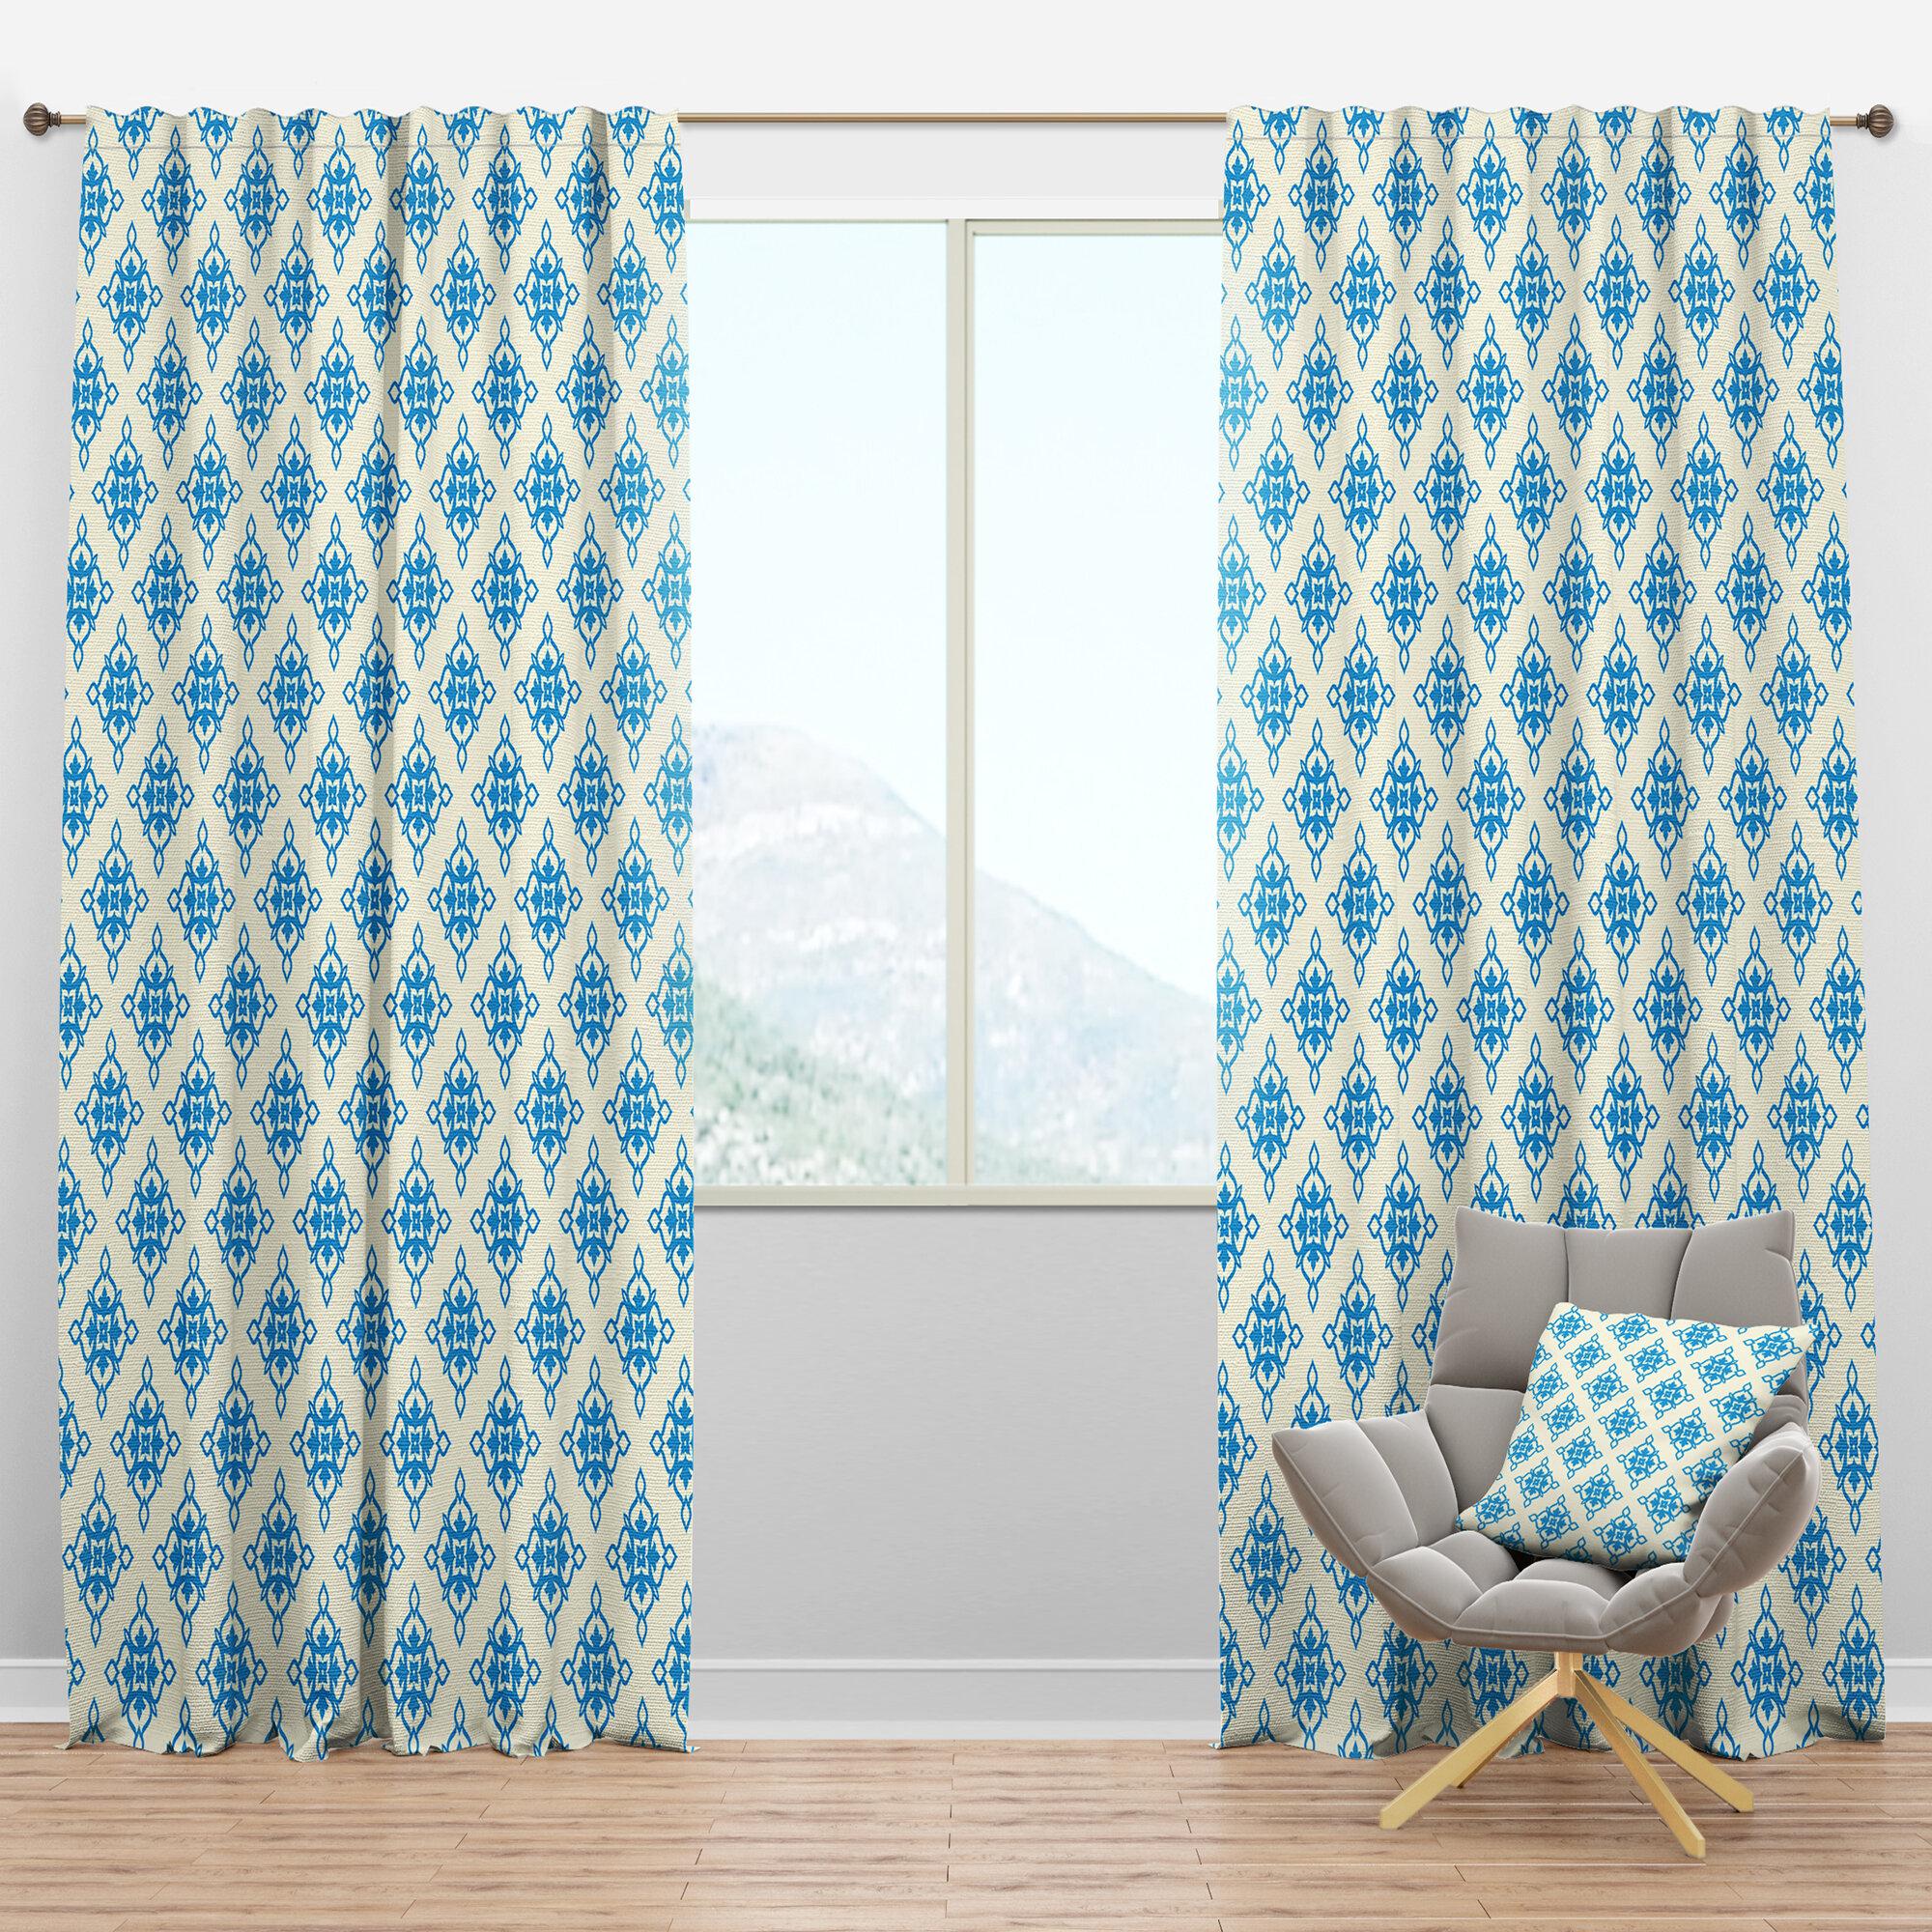 Designart Mid Century Ornamental I Floral Semi Sheer Thermal Rod Pocket Curtain Panels Wayfair